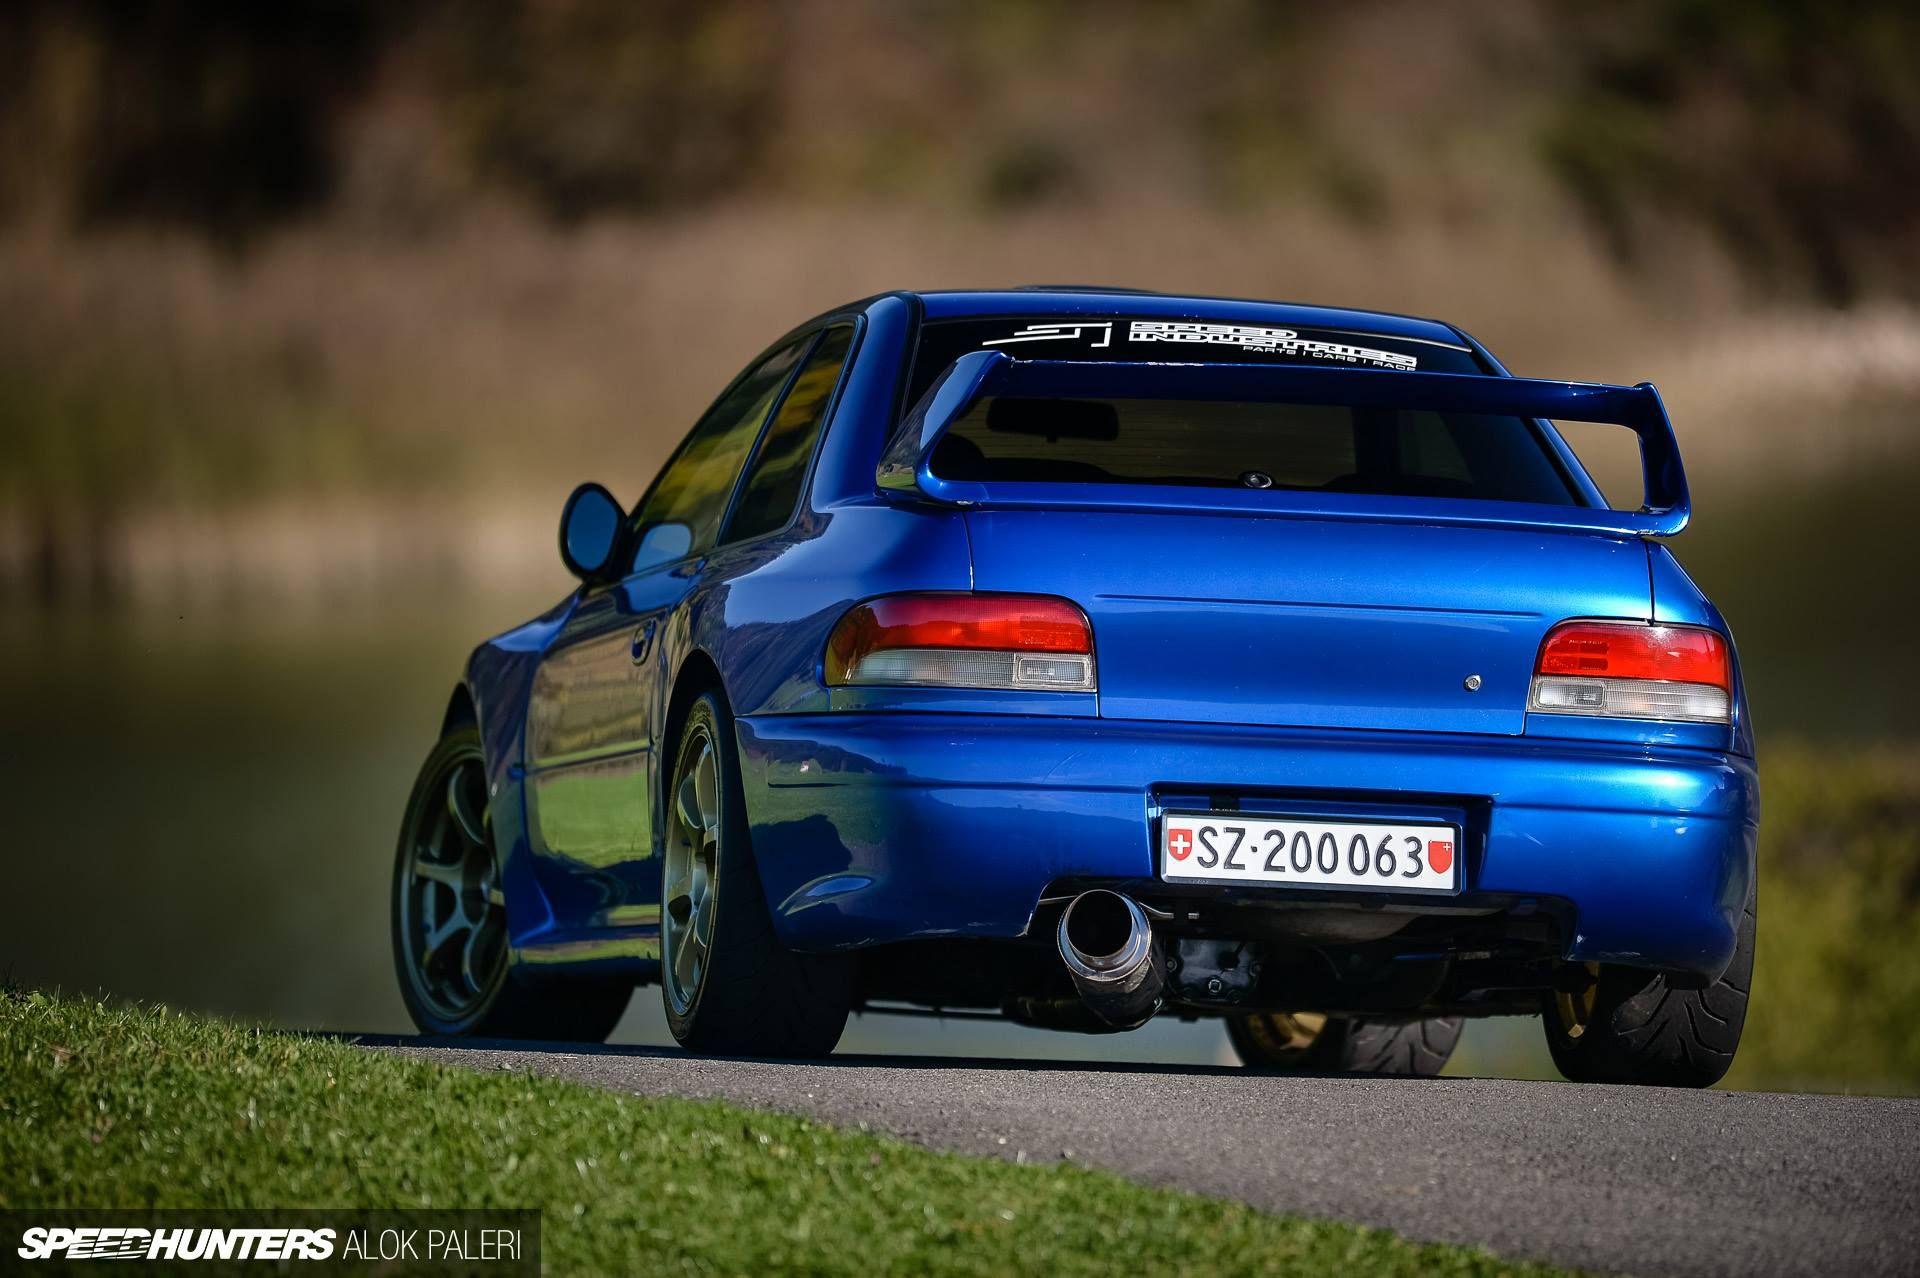 Subaru impreza gc8 tuning wrc replica subaru pinterest subaru subaru impreza gc8 tuning wrc replica altavistaventures Gallery